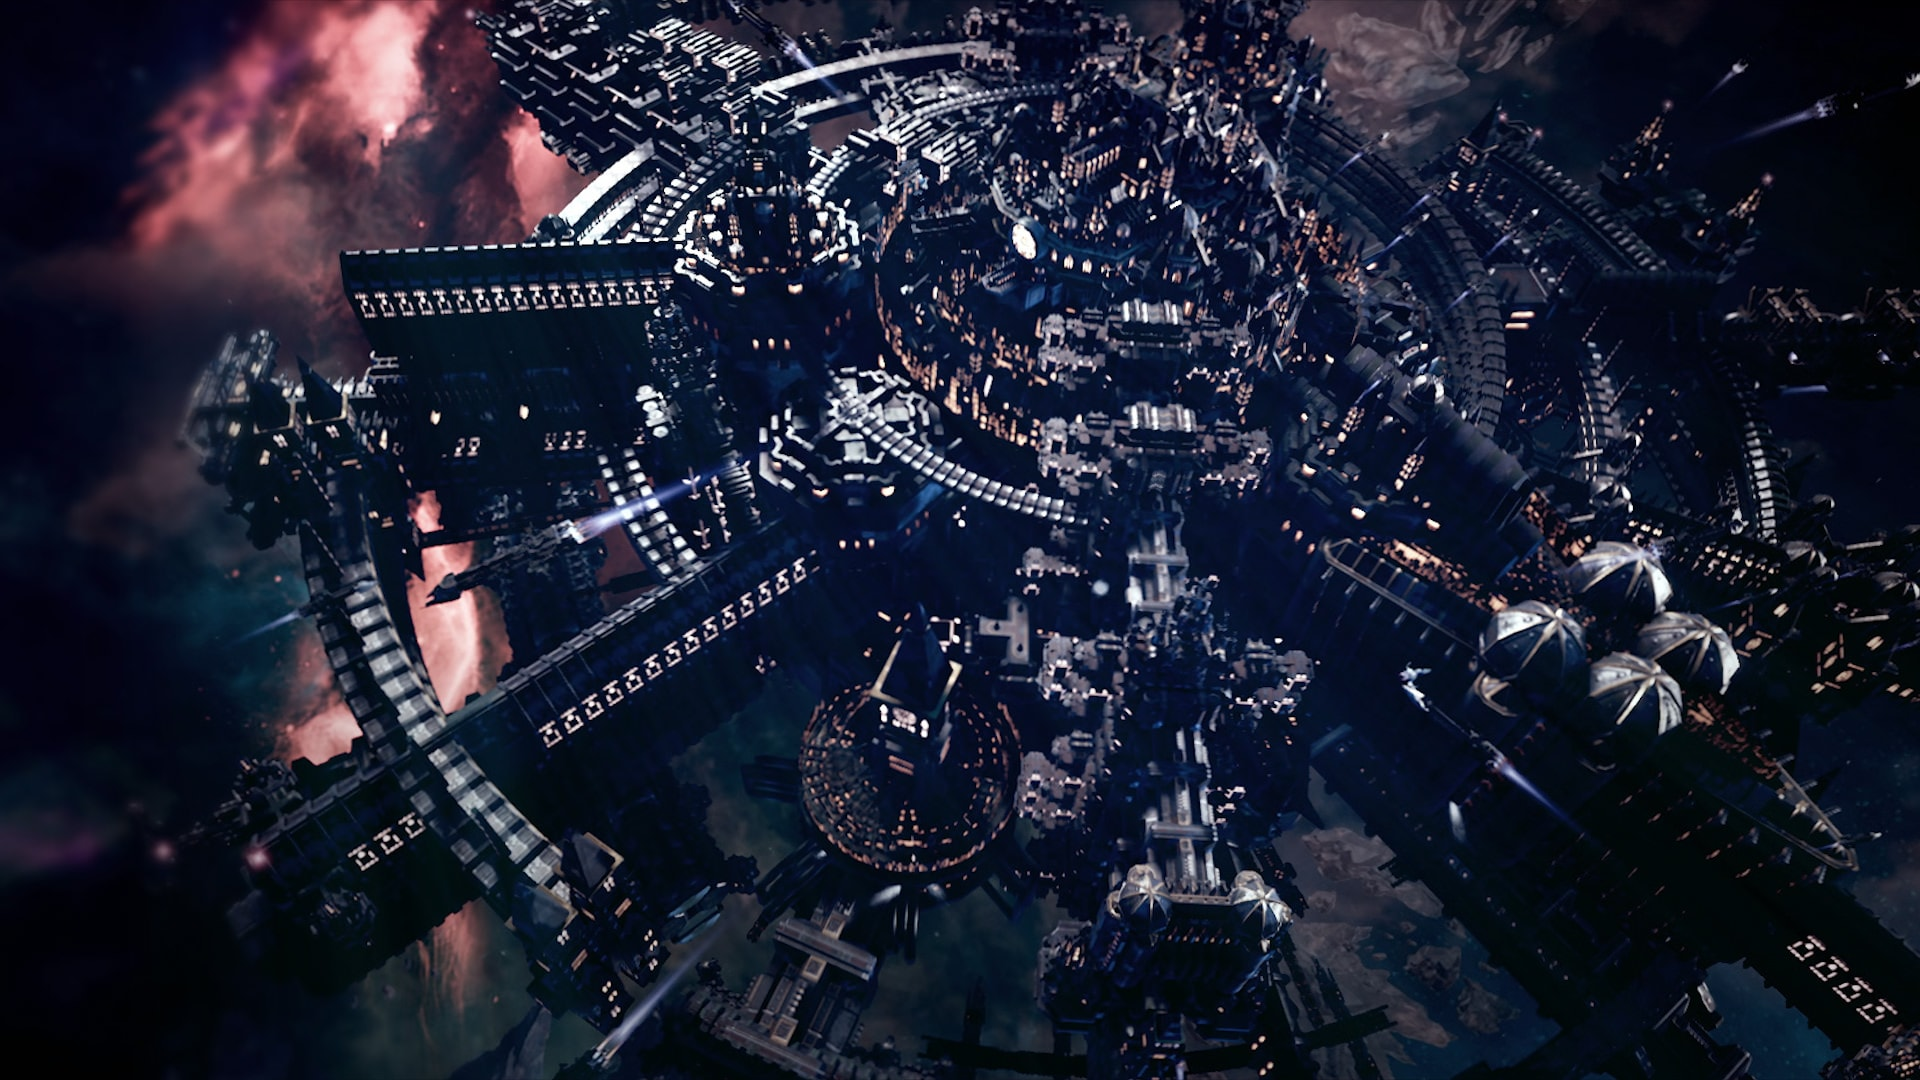 Battlefleet Gothic: Armada Full hd wallpapers